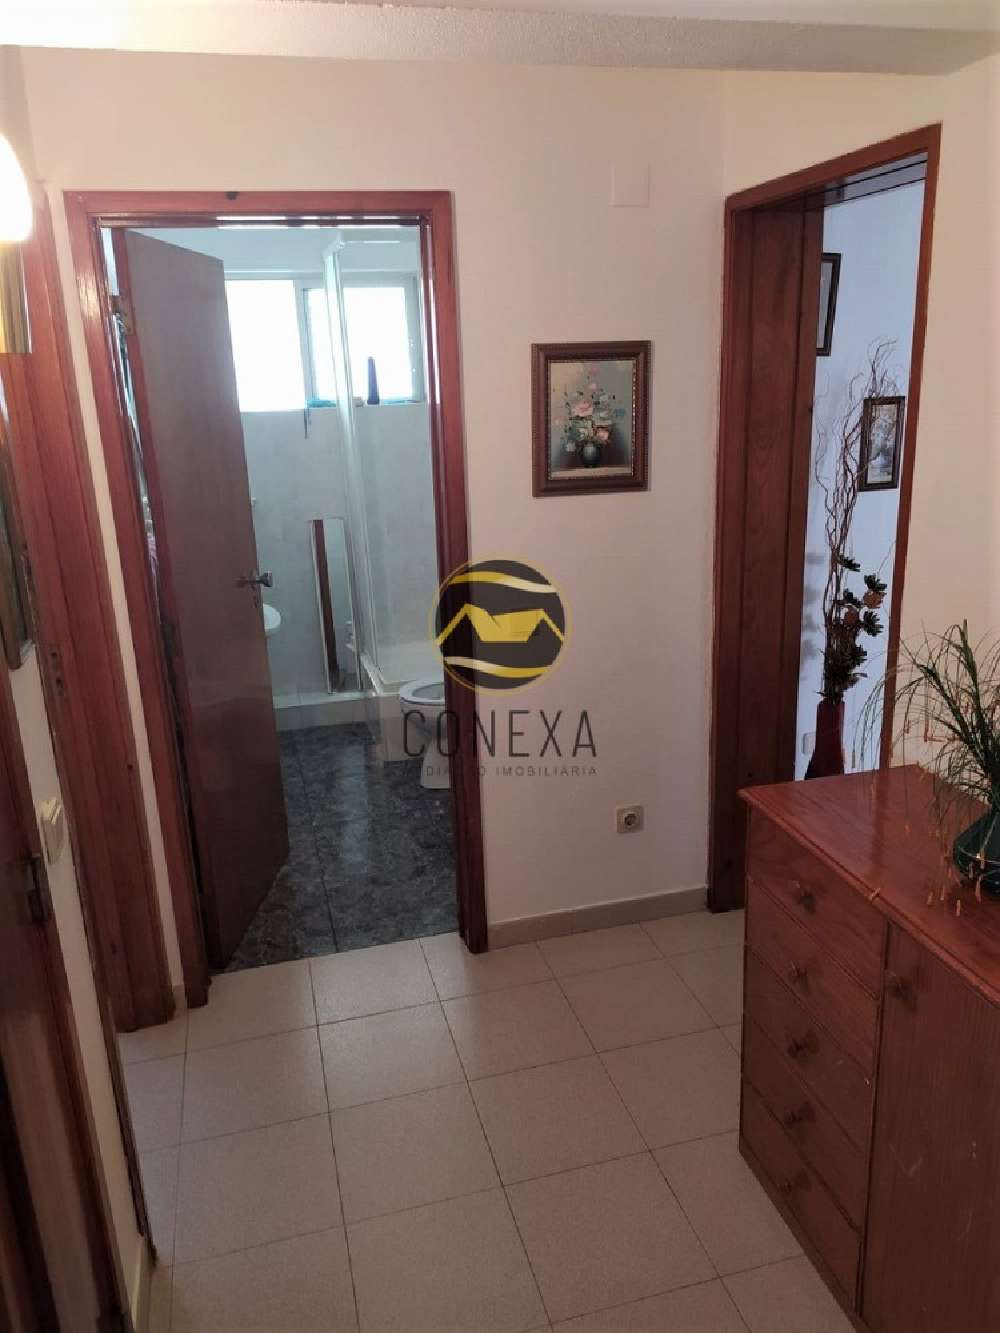 Olhão Olhão 公寓 照片 #request.properties.id#